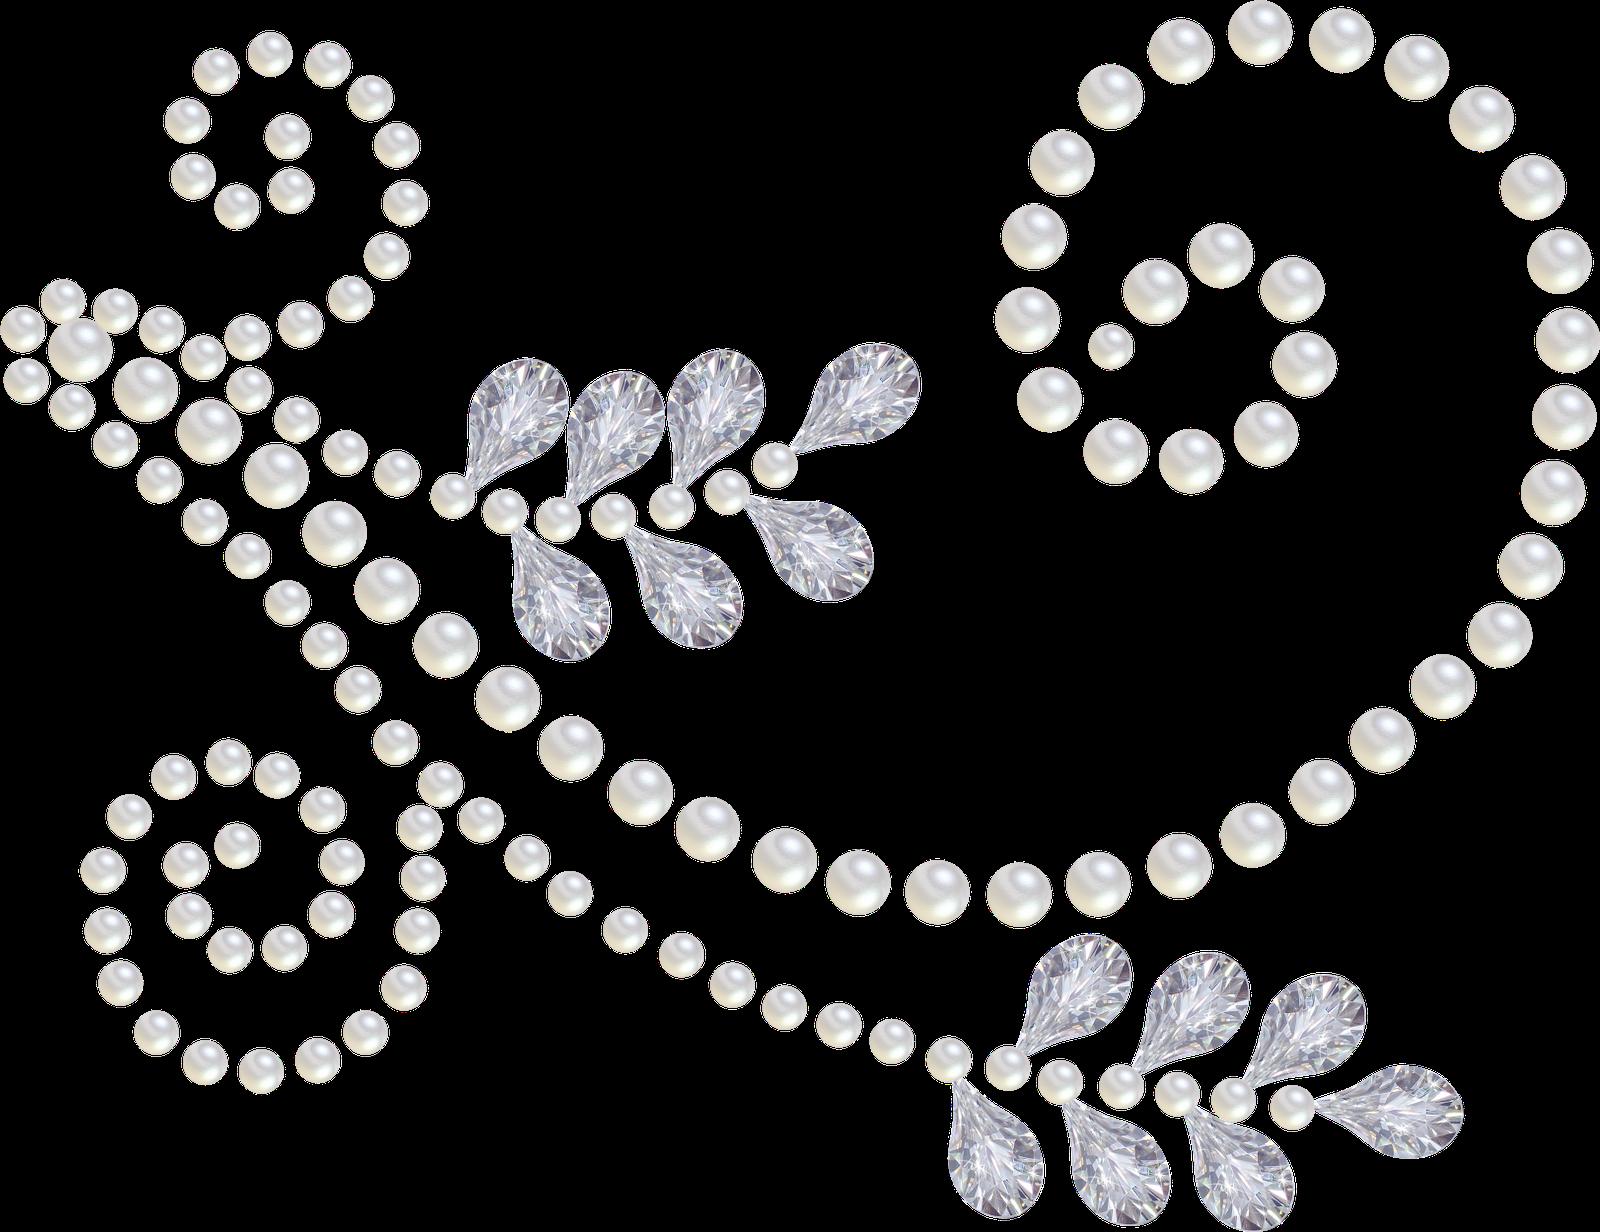 Pearl and clip art. Clipart diamond swirl